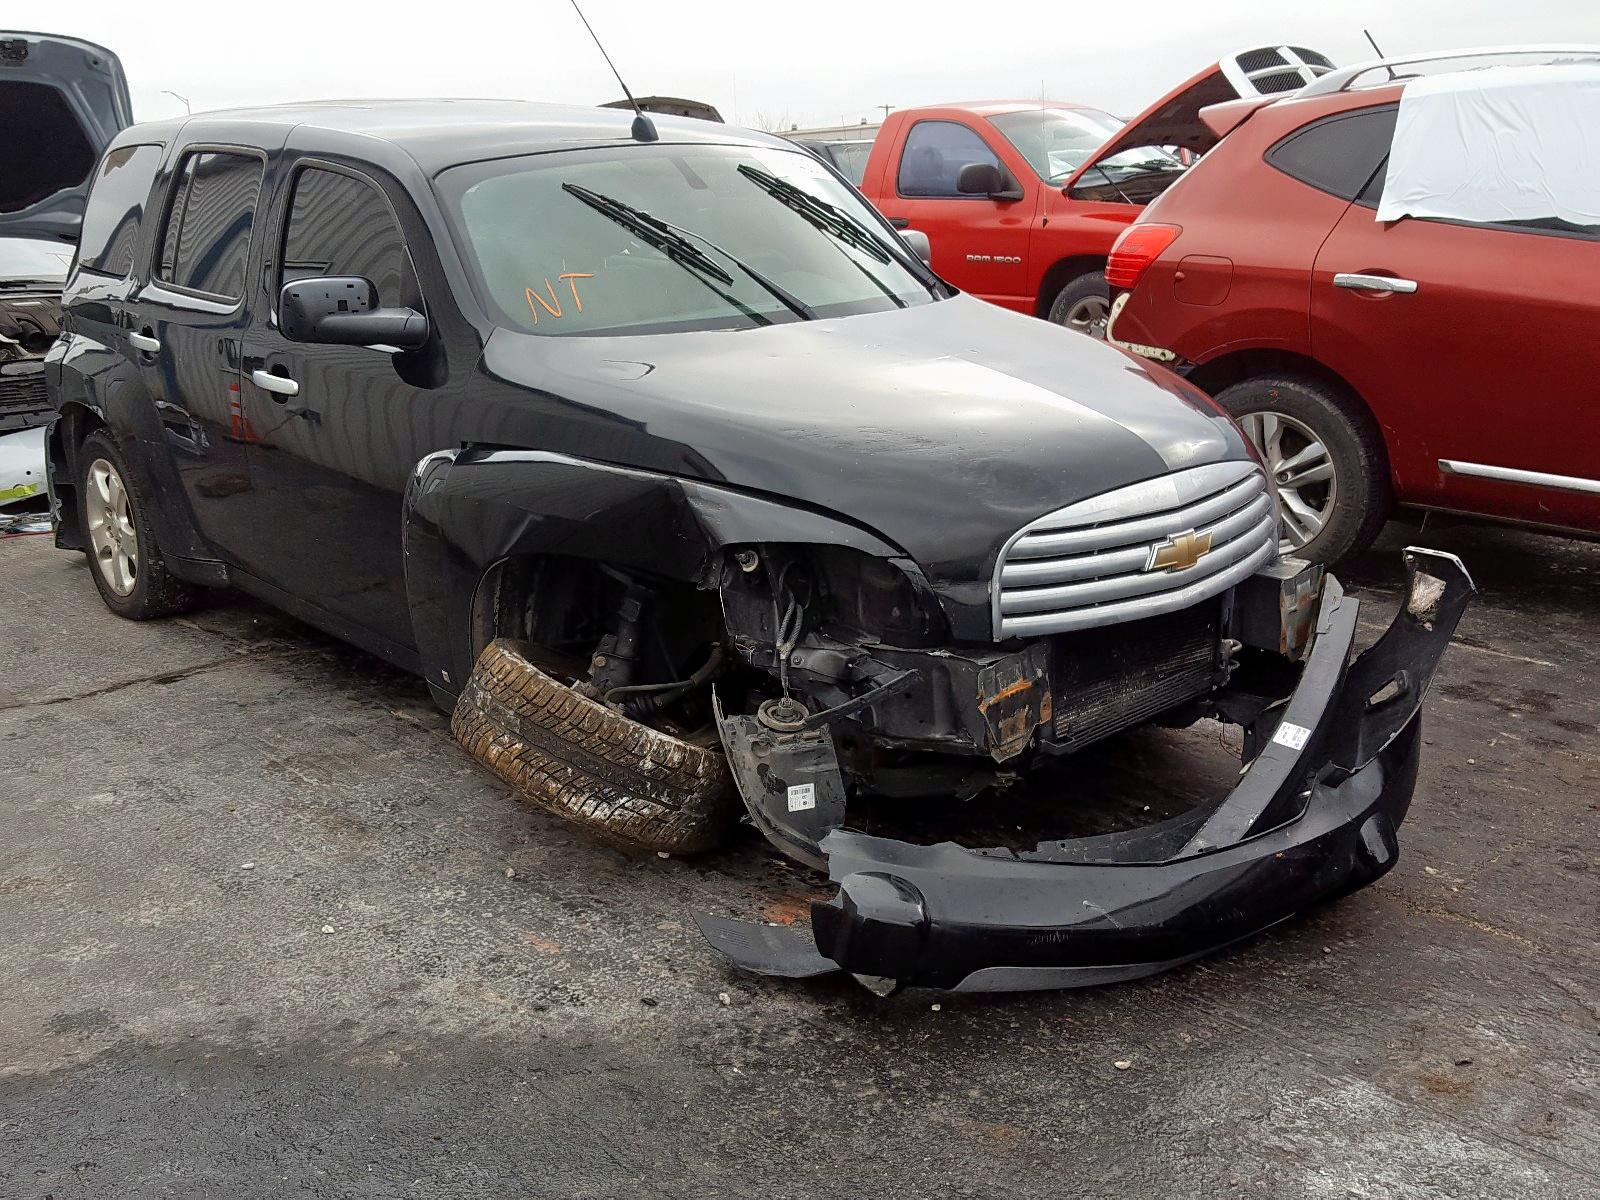 2007 Chevrolet Hhr Ls For Sale At Copart Tulsa Ok Lot 26794050